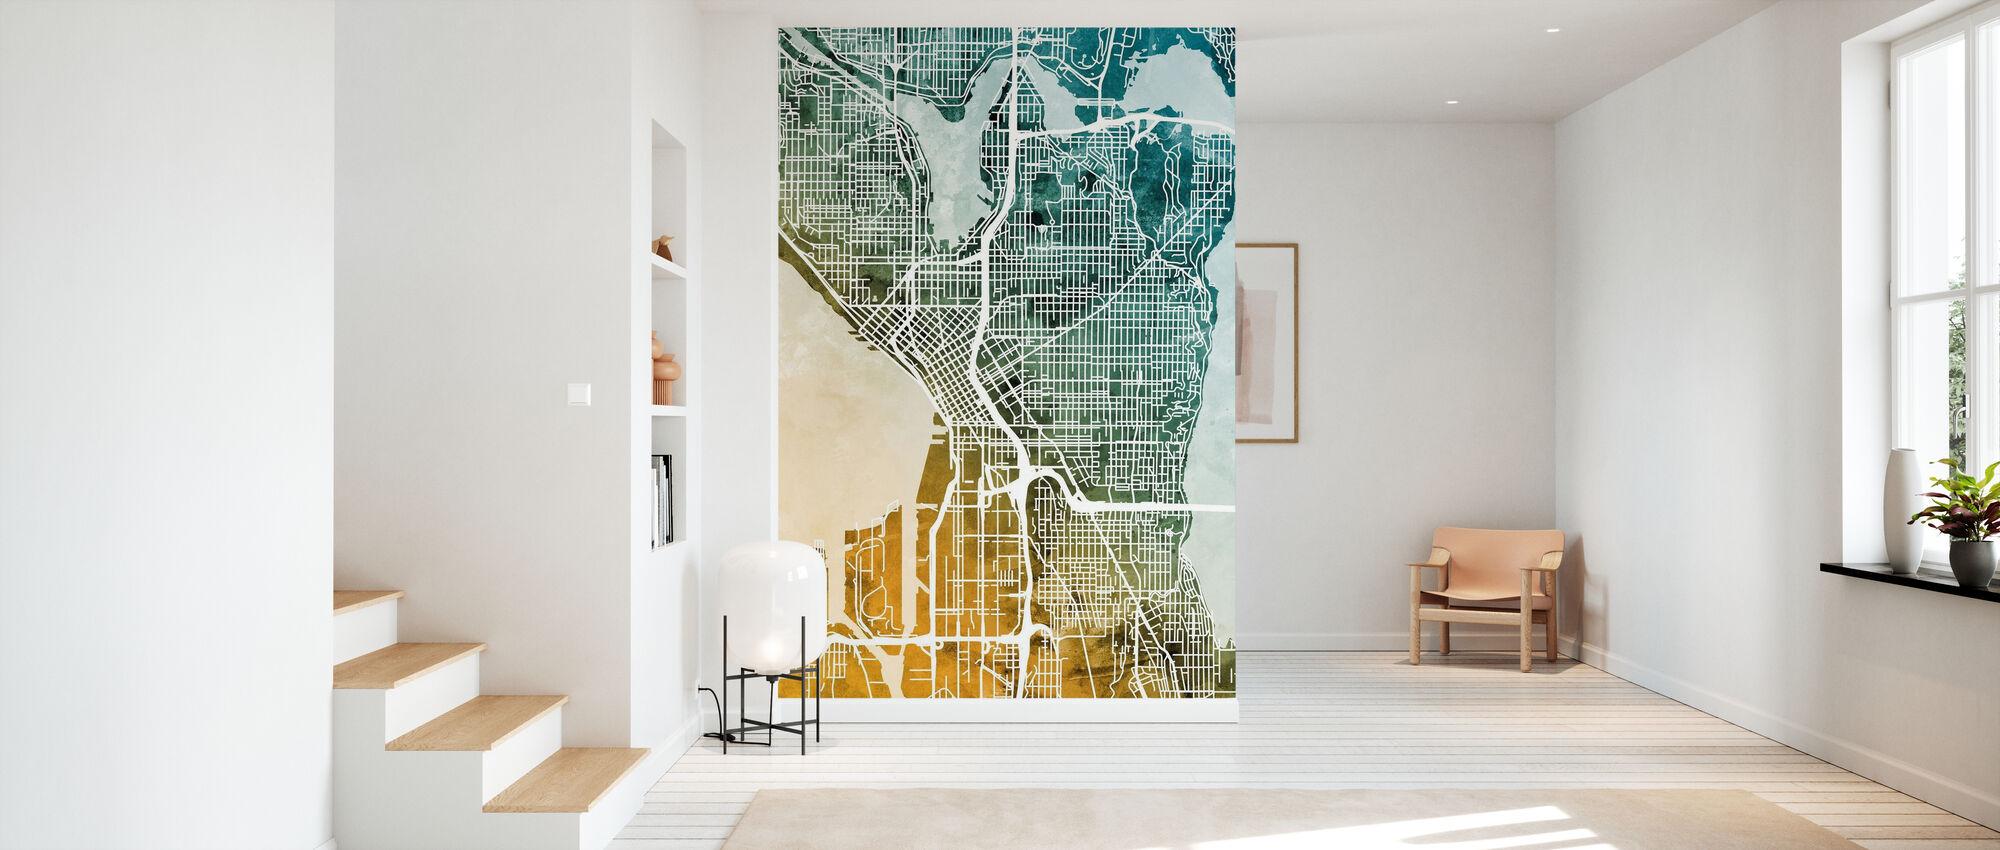 Seattle Washington Street Map - Wallpaper - Hallway